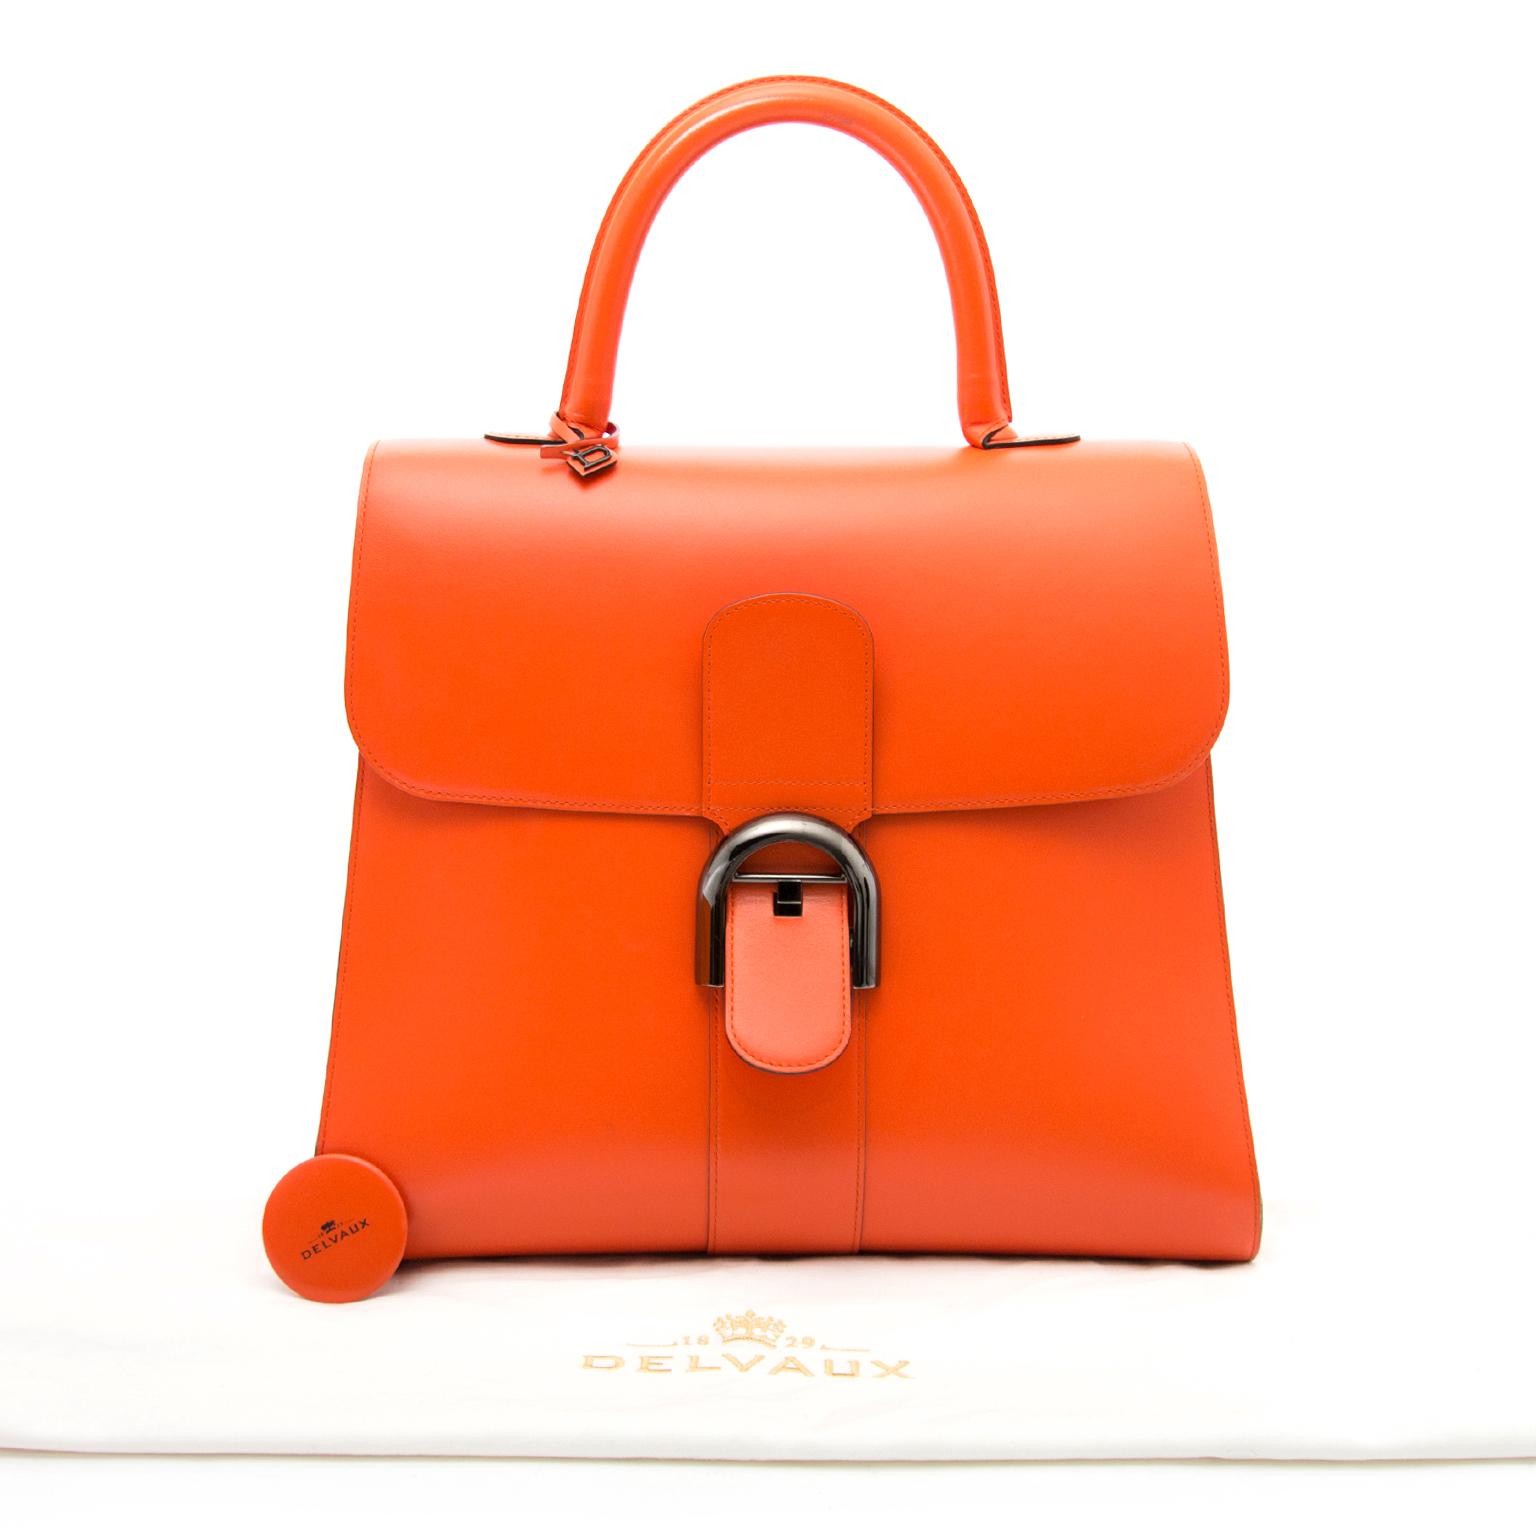 delvaux brillant black edition mandarine nu online bij labellov.com tegen de beste prijs shop veilig online